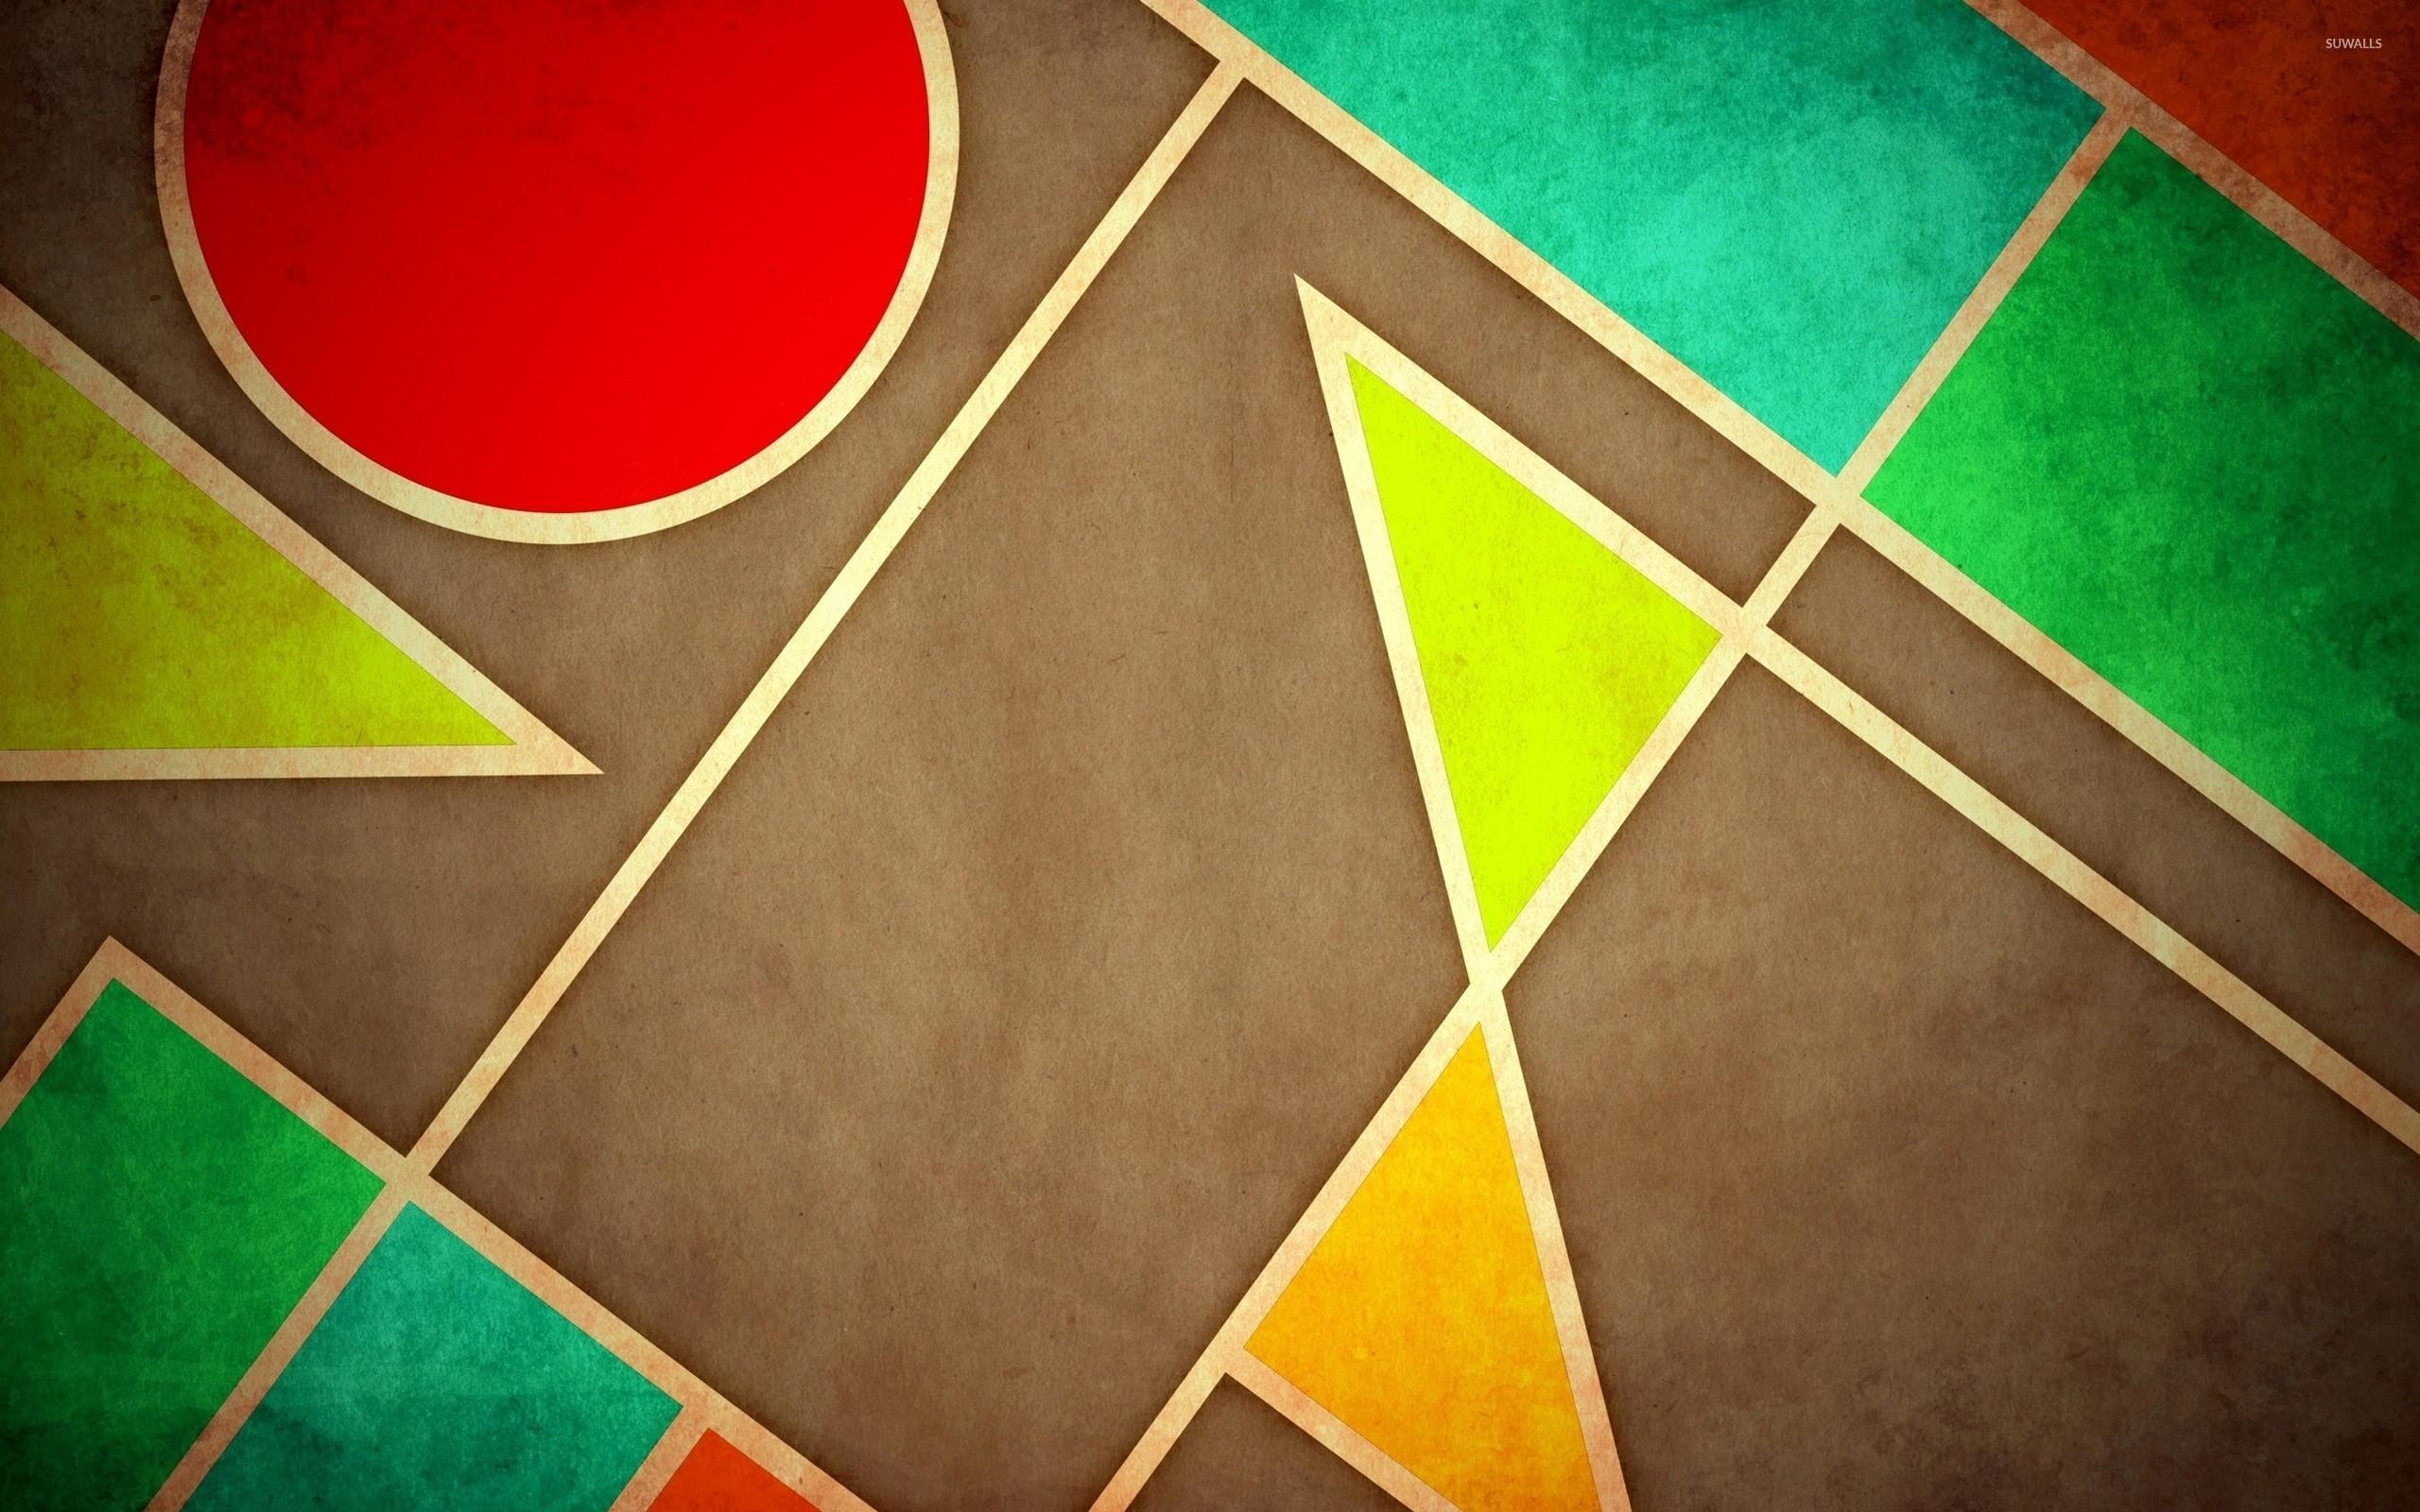 Pastel geometric shapes wallpaper – Digital Art wallpapers .